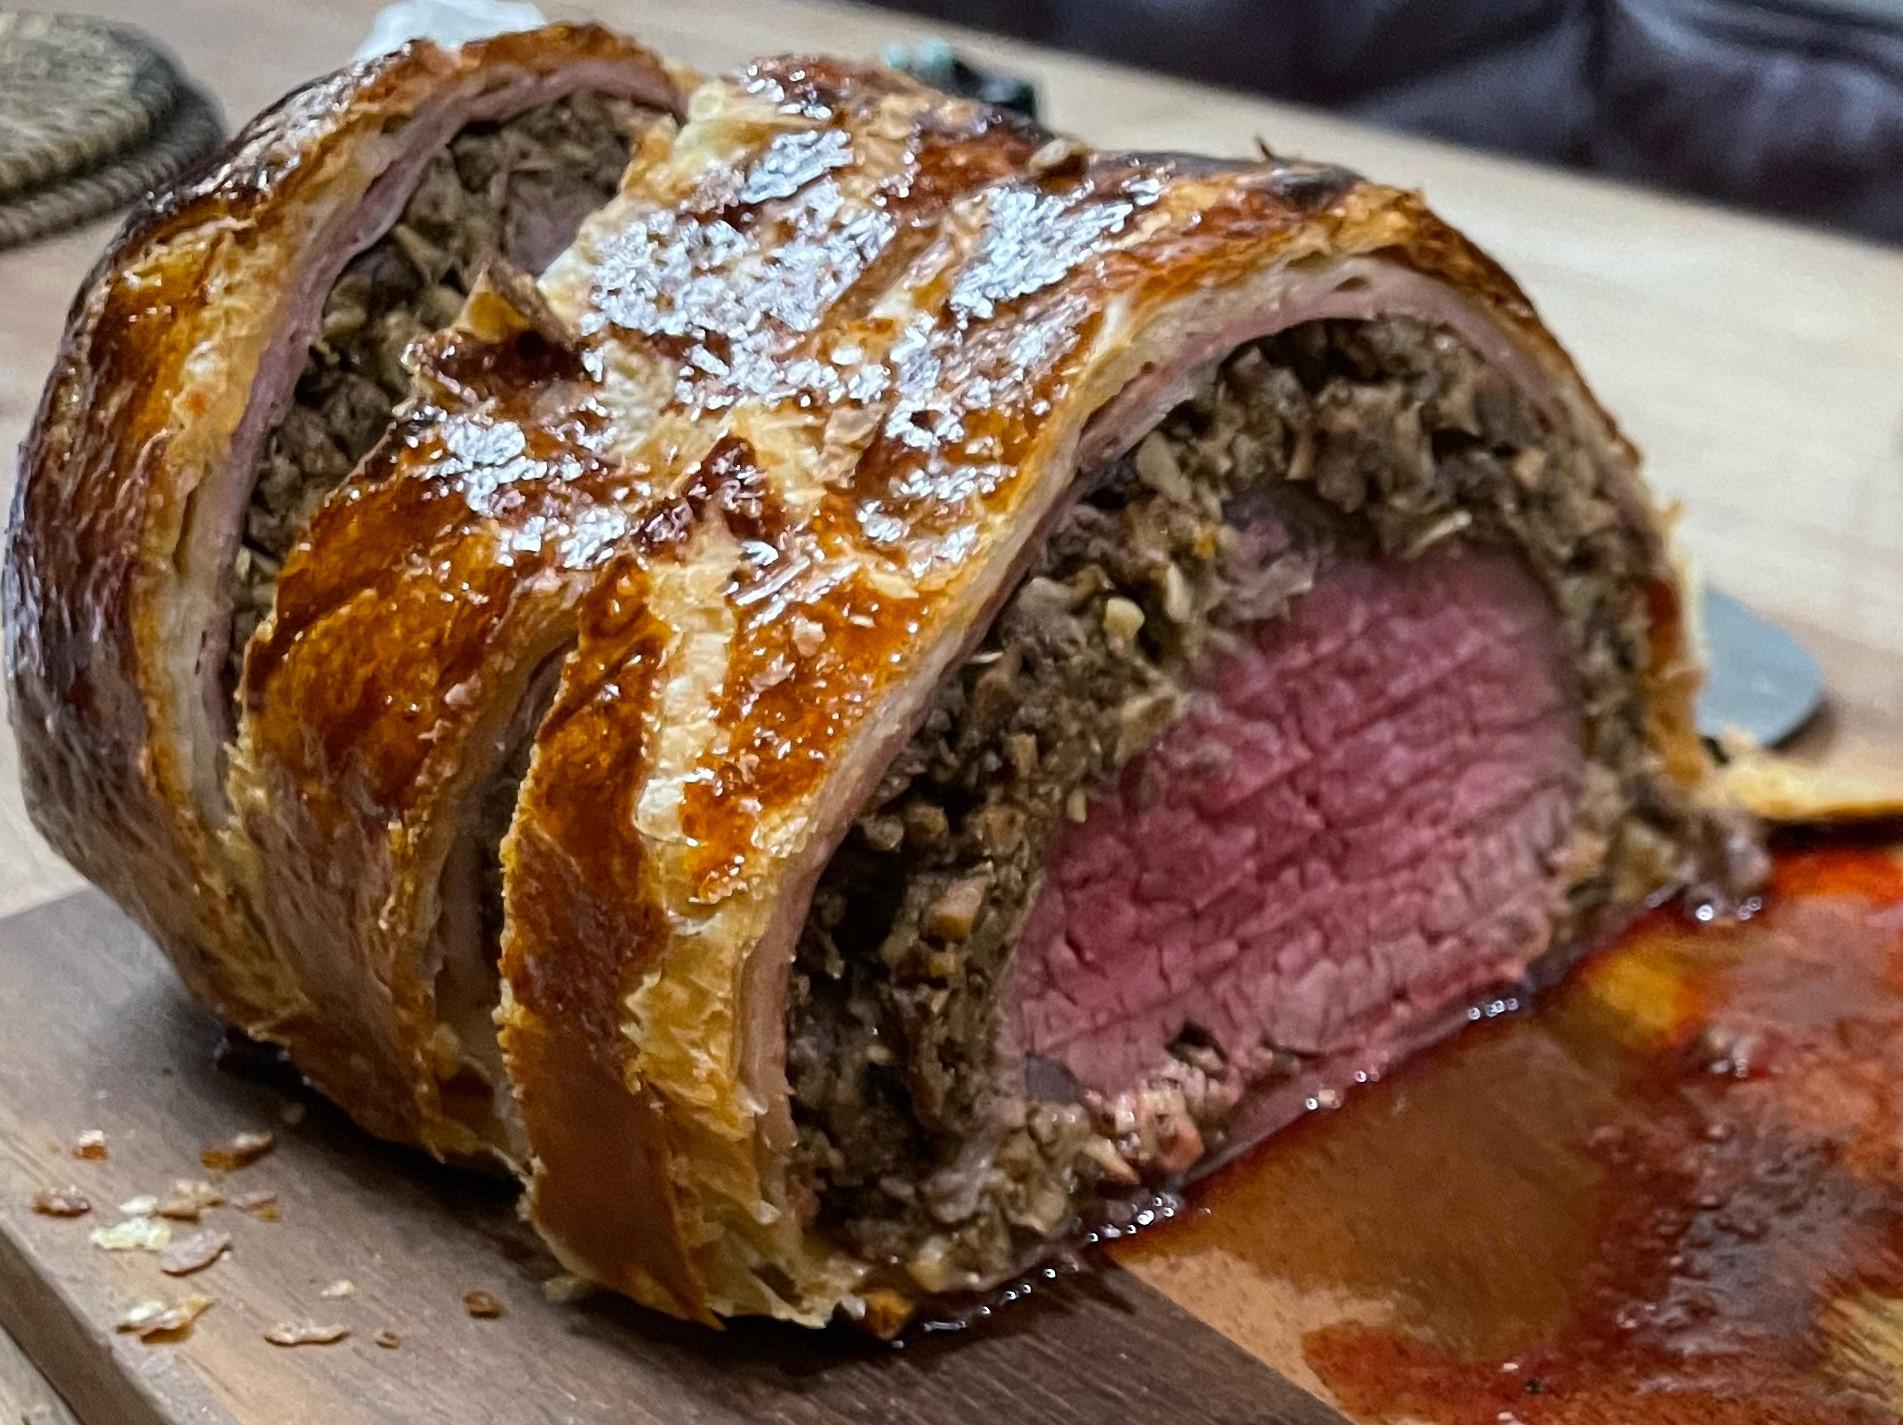 威靈頓牛排Beef Wellington